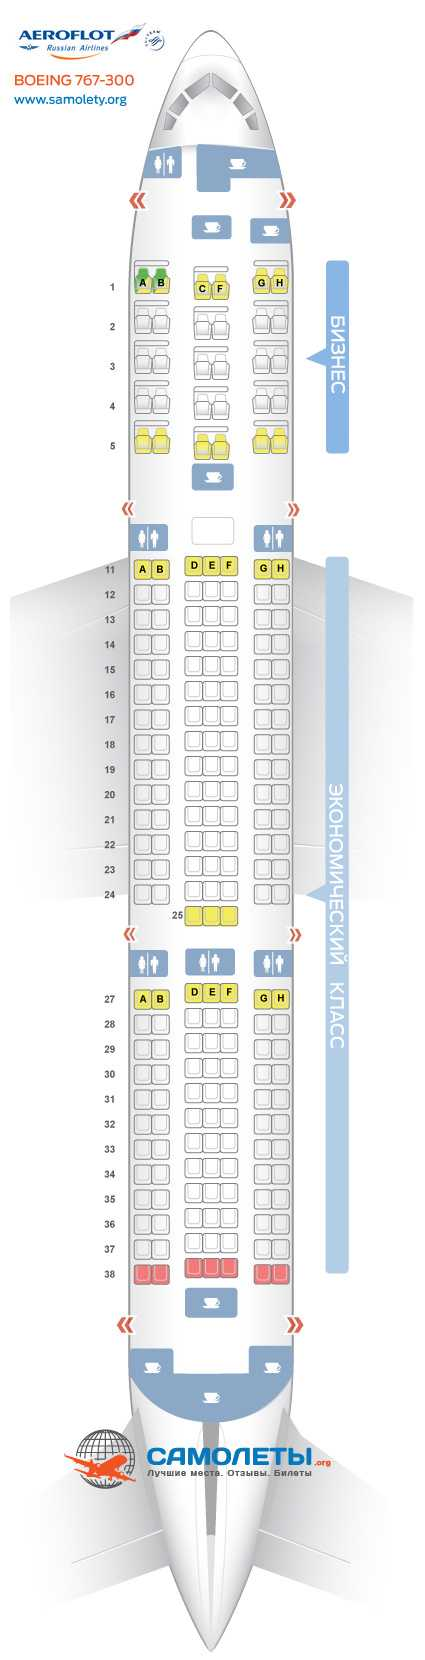 боинг 767 схема